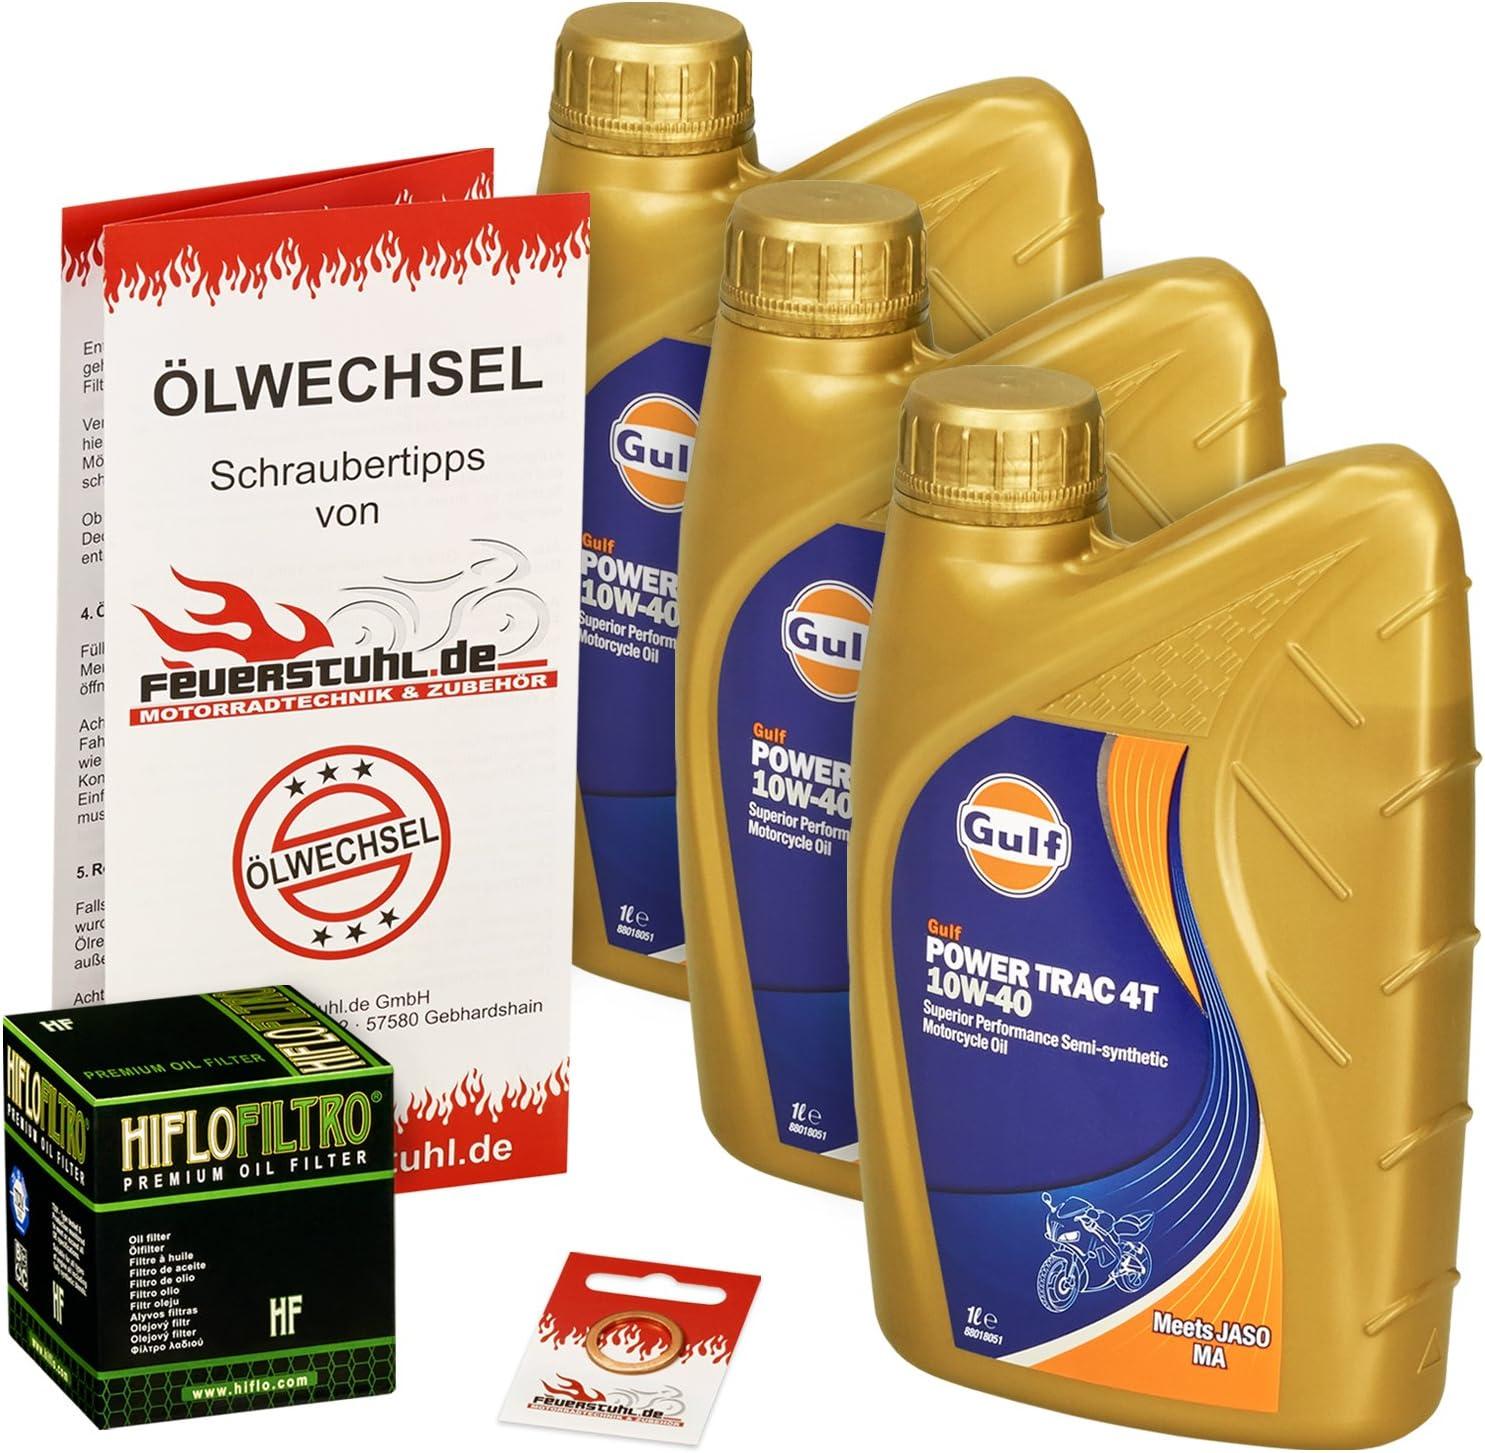 Gulf 10w 40 Öl Hiflo Ölfilter Für Honda Vt 600 C Shadow 88 00 Pc21 Ölwechselset Inkl Motoröl Filter Dichtring Auto